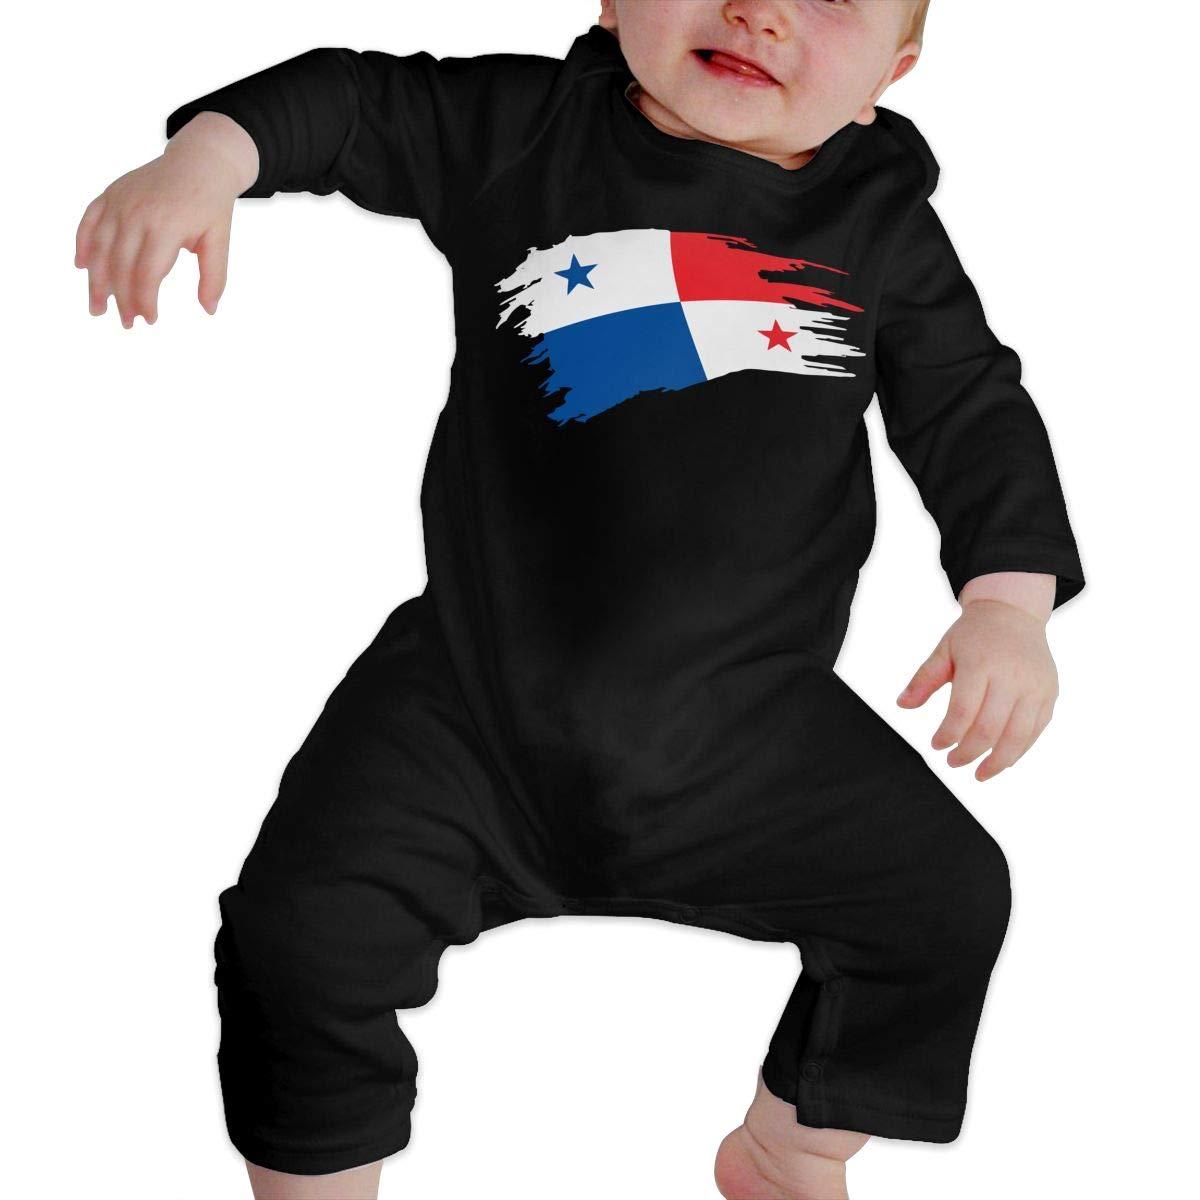 UGFGF-S3 Palestine Flag Newborn Kids Long Sleeve Romper Jumpsuit Coverall